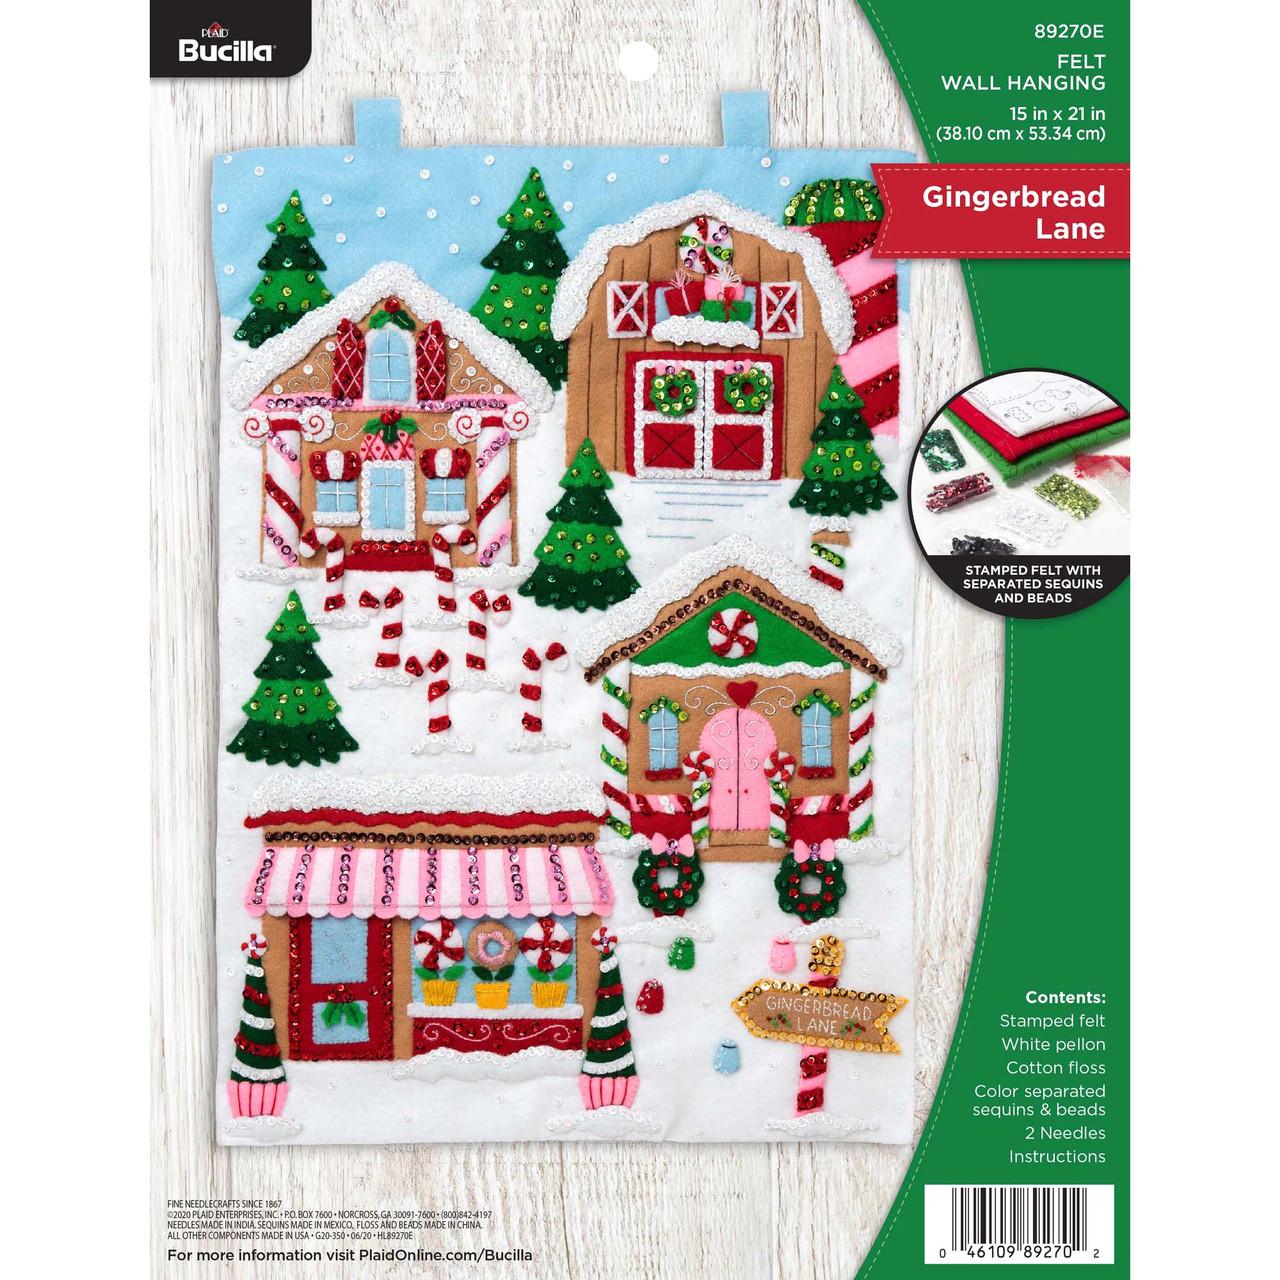 Plaid / Bucilla - Gingerbread Lane Christmas Wall Hanging